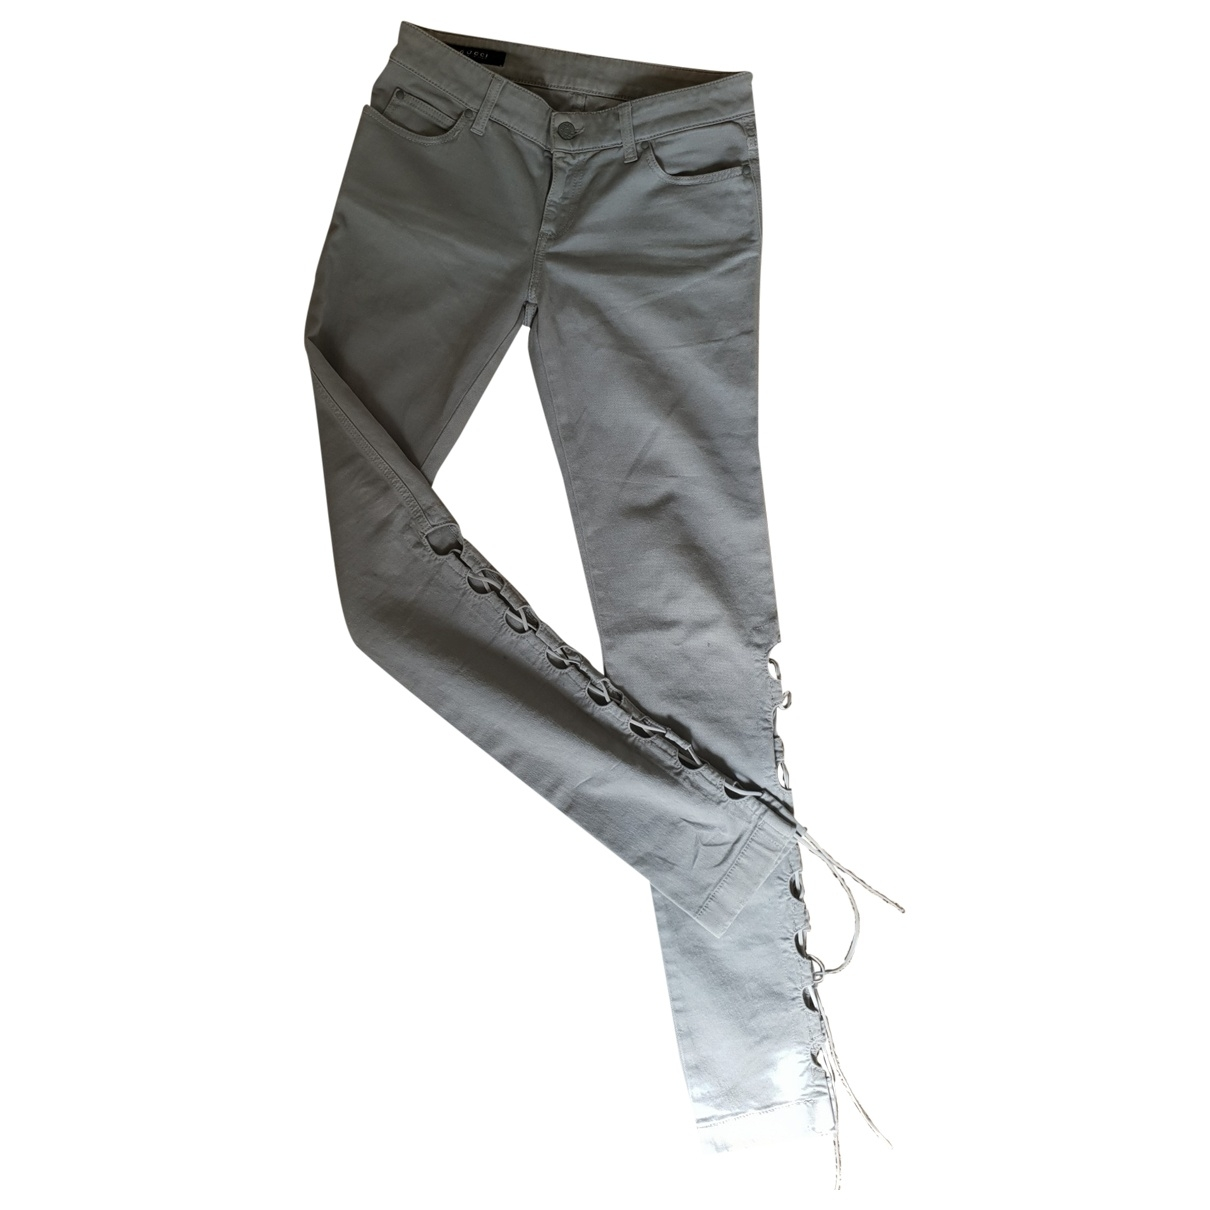 Gucci \N Grey Cotton - elasthane Jeans for Women 38 FR